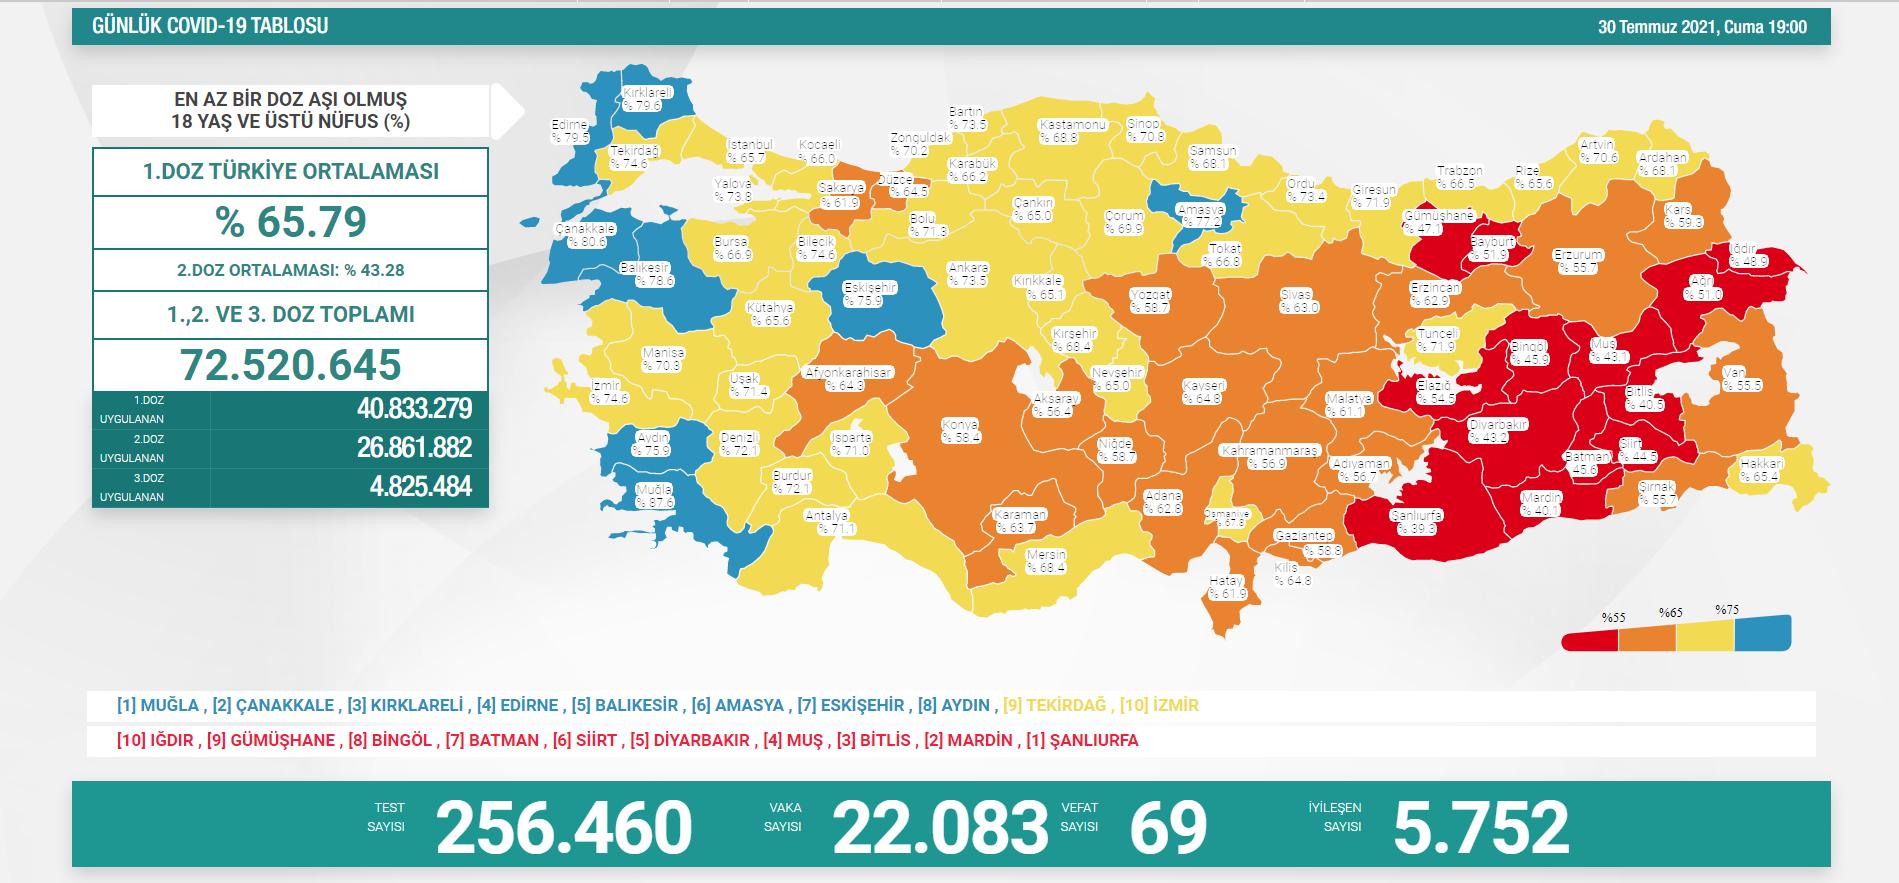 30-temmuz-turkiyede-koronavirus-tablosu.png